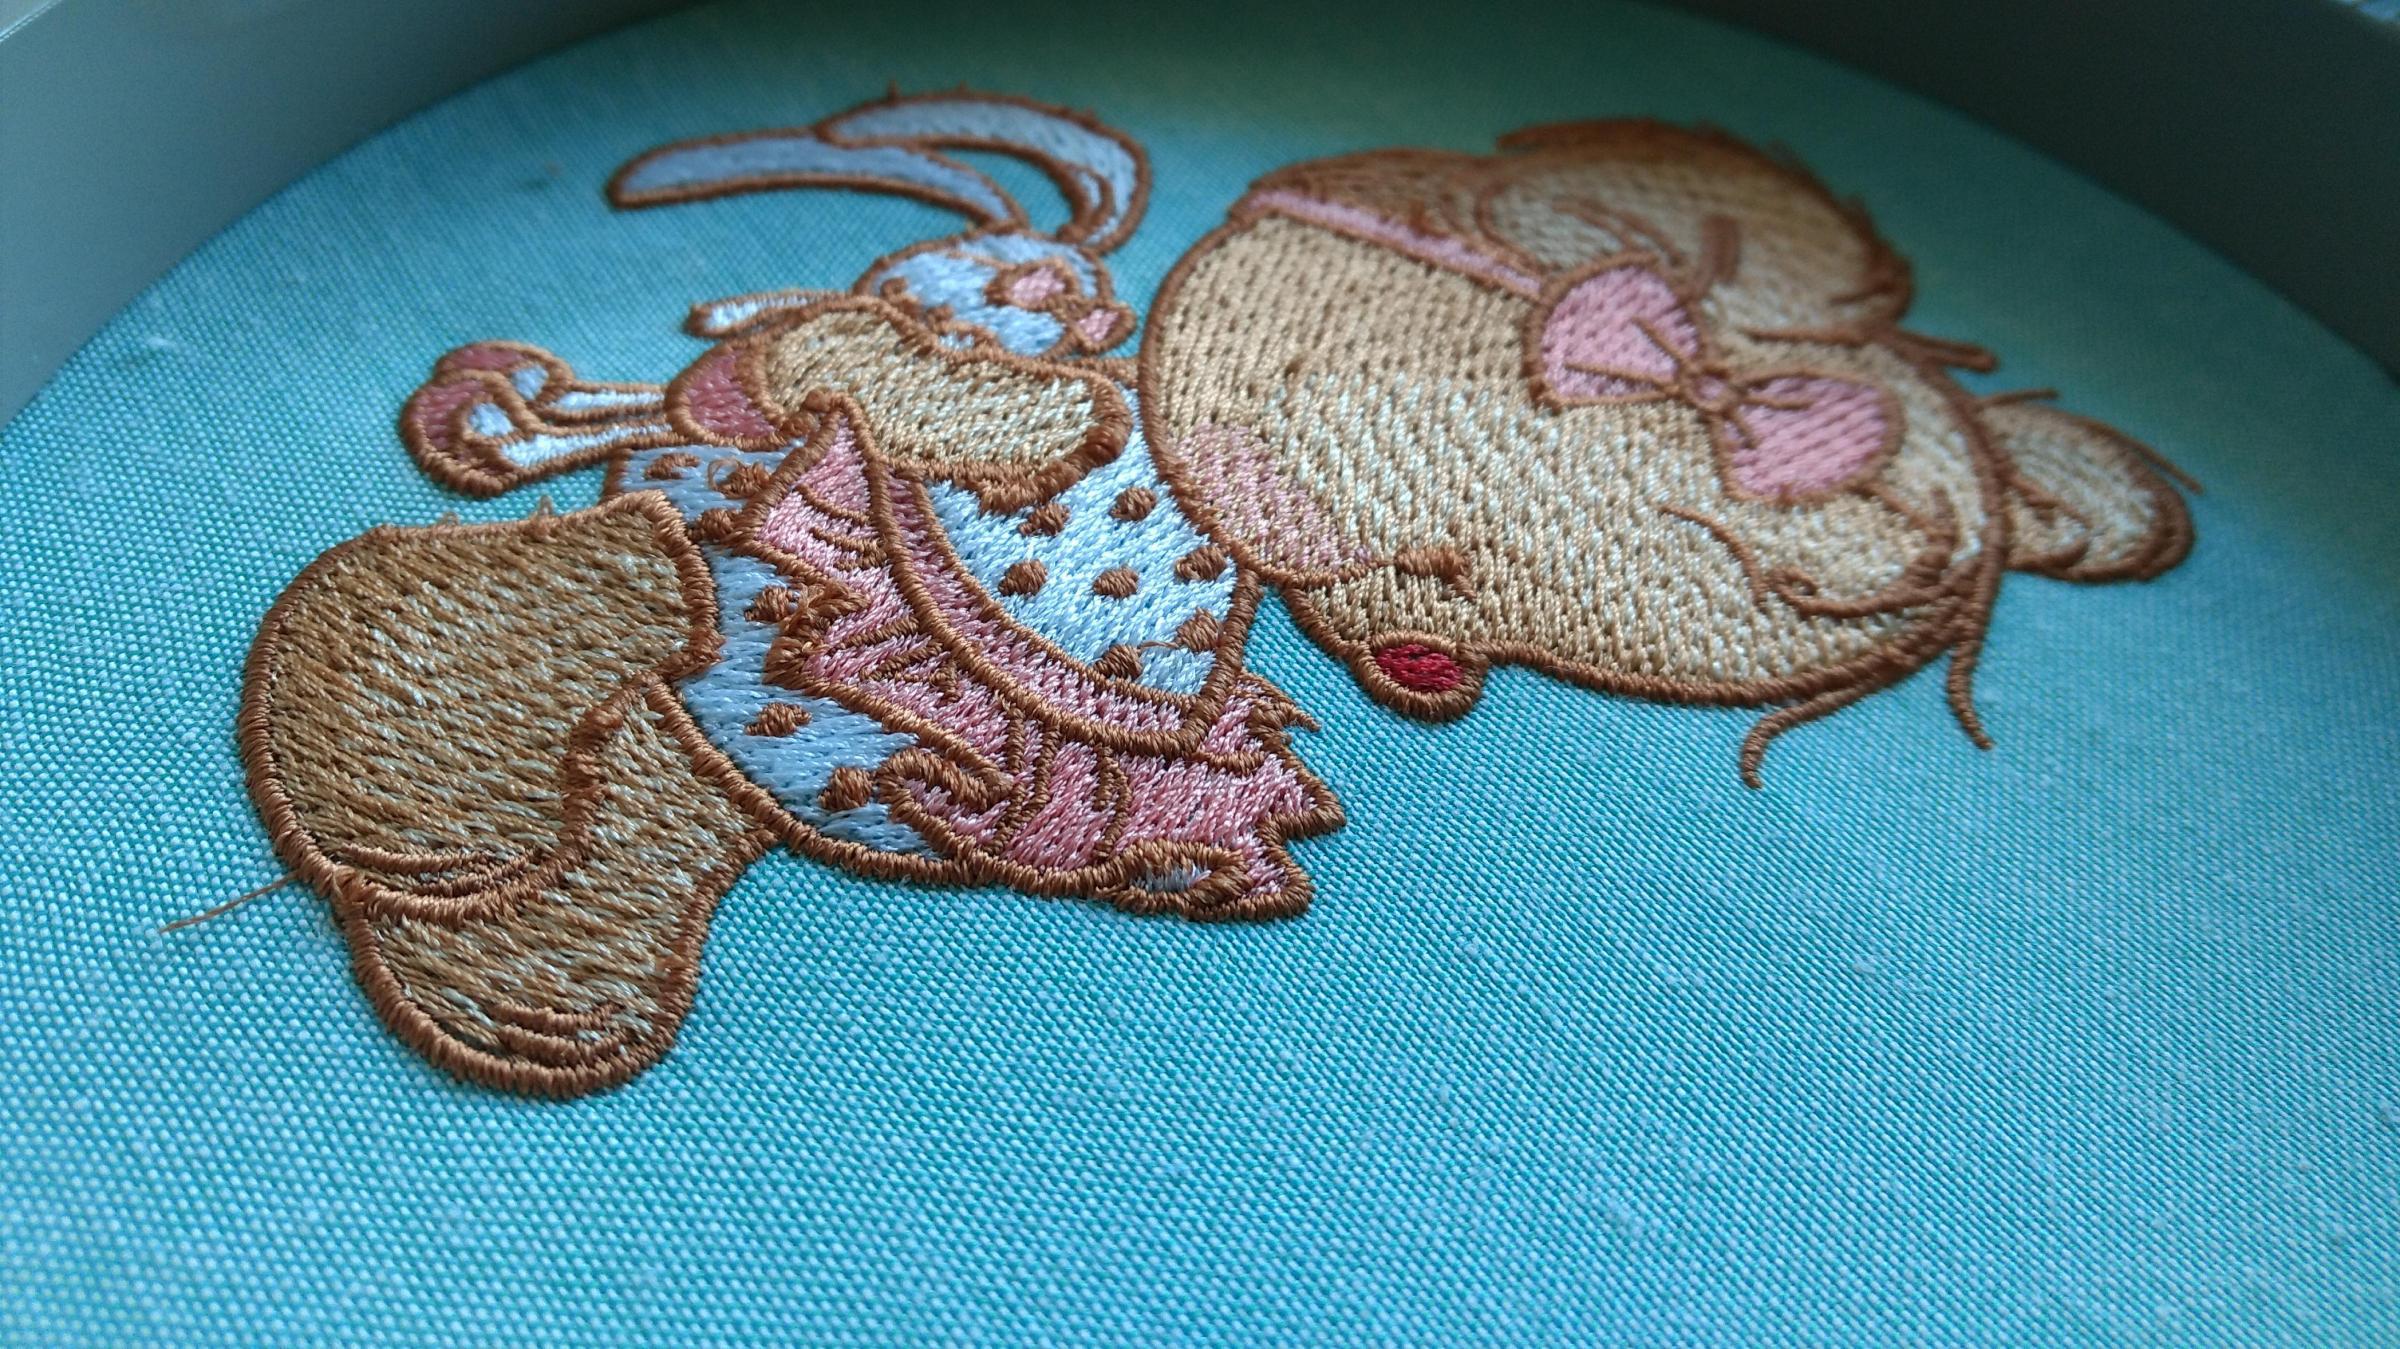 In hoop cute teddy bear embroidery design - Teddy bear